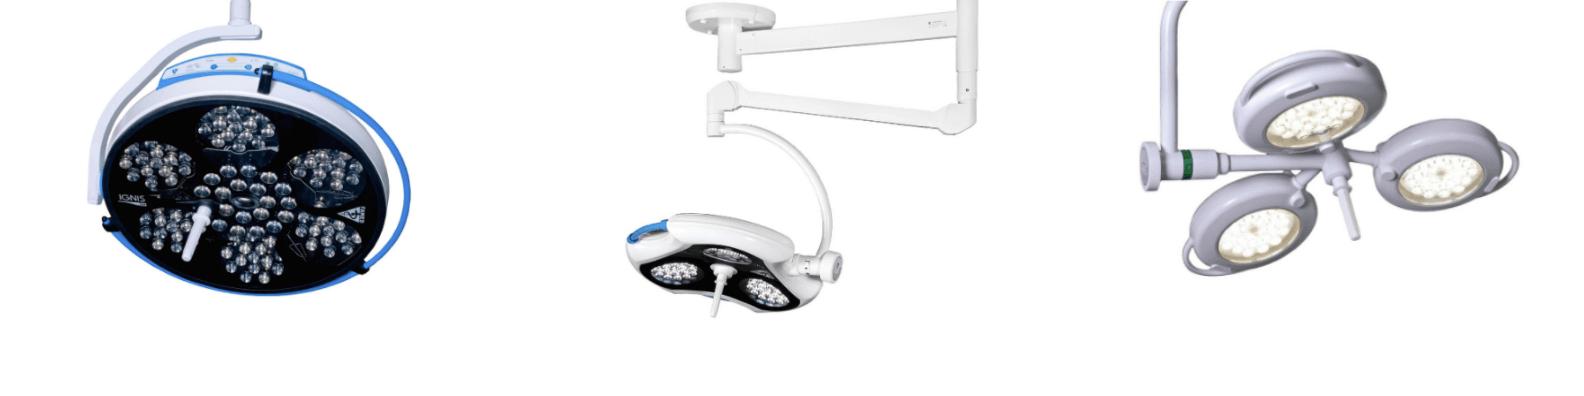 Interlab operating lights